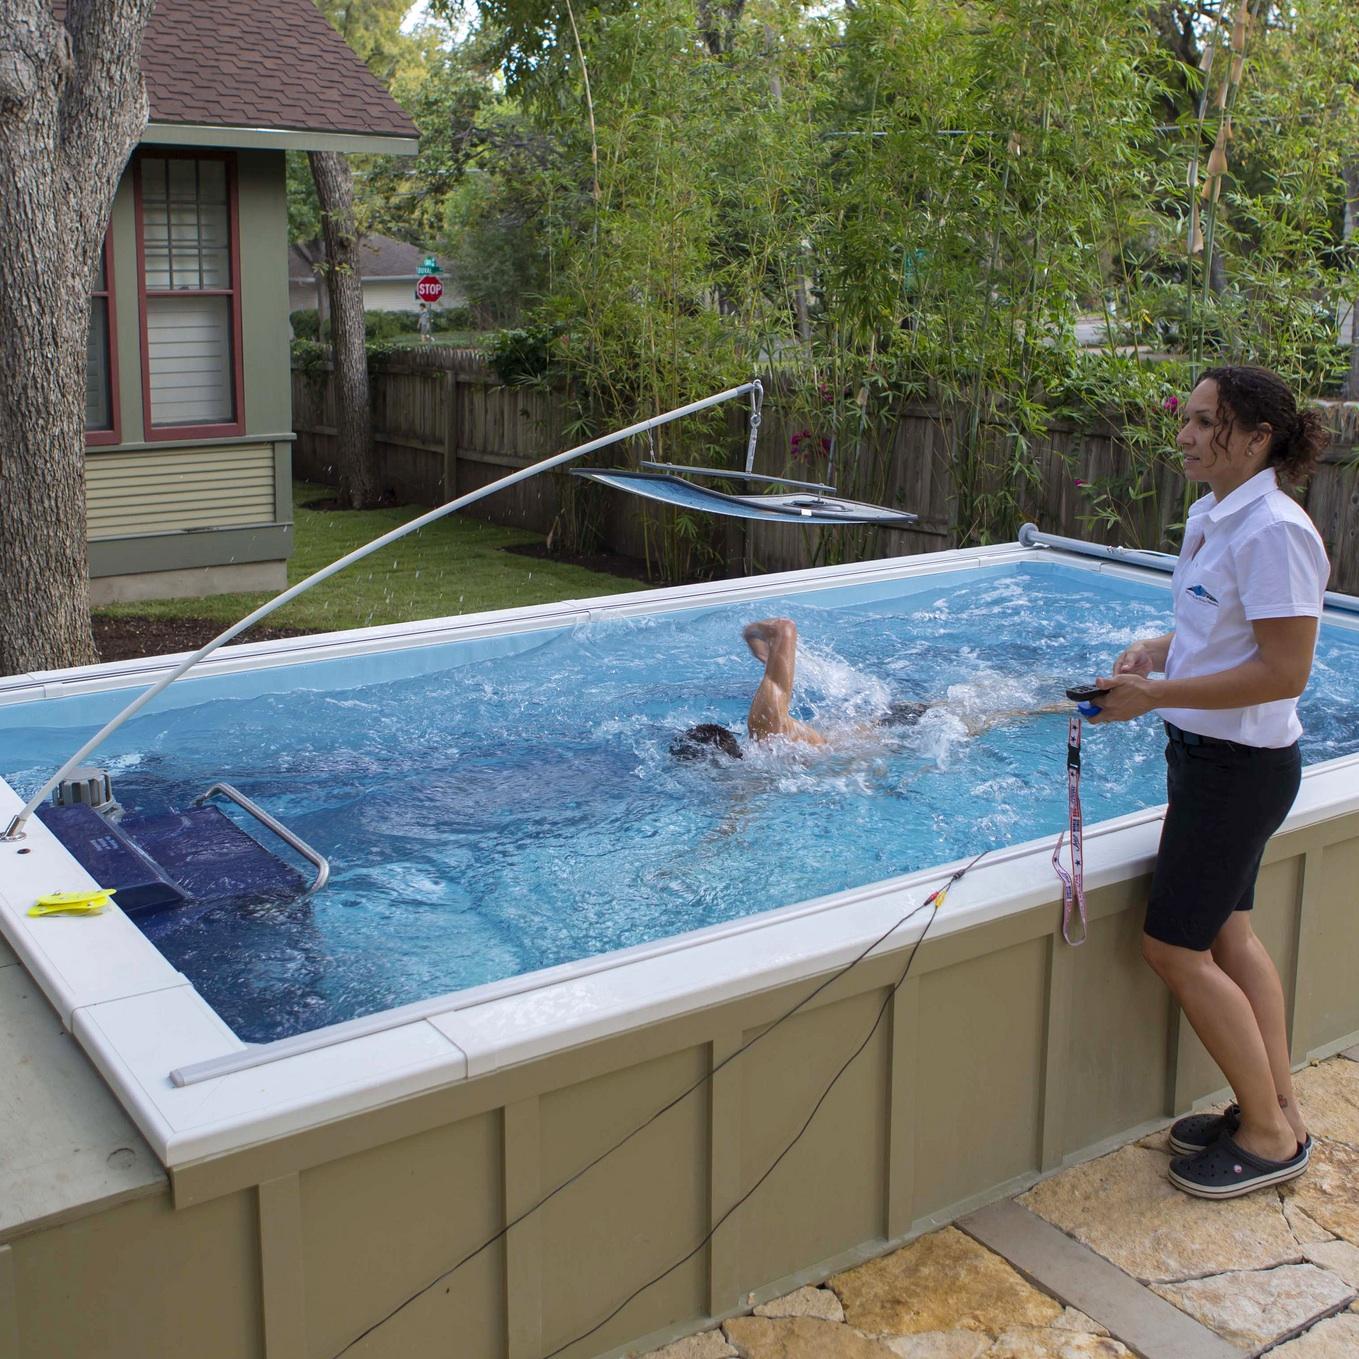 10 Reasons to Use an Endless Pool | Endless Pools ...